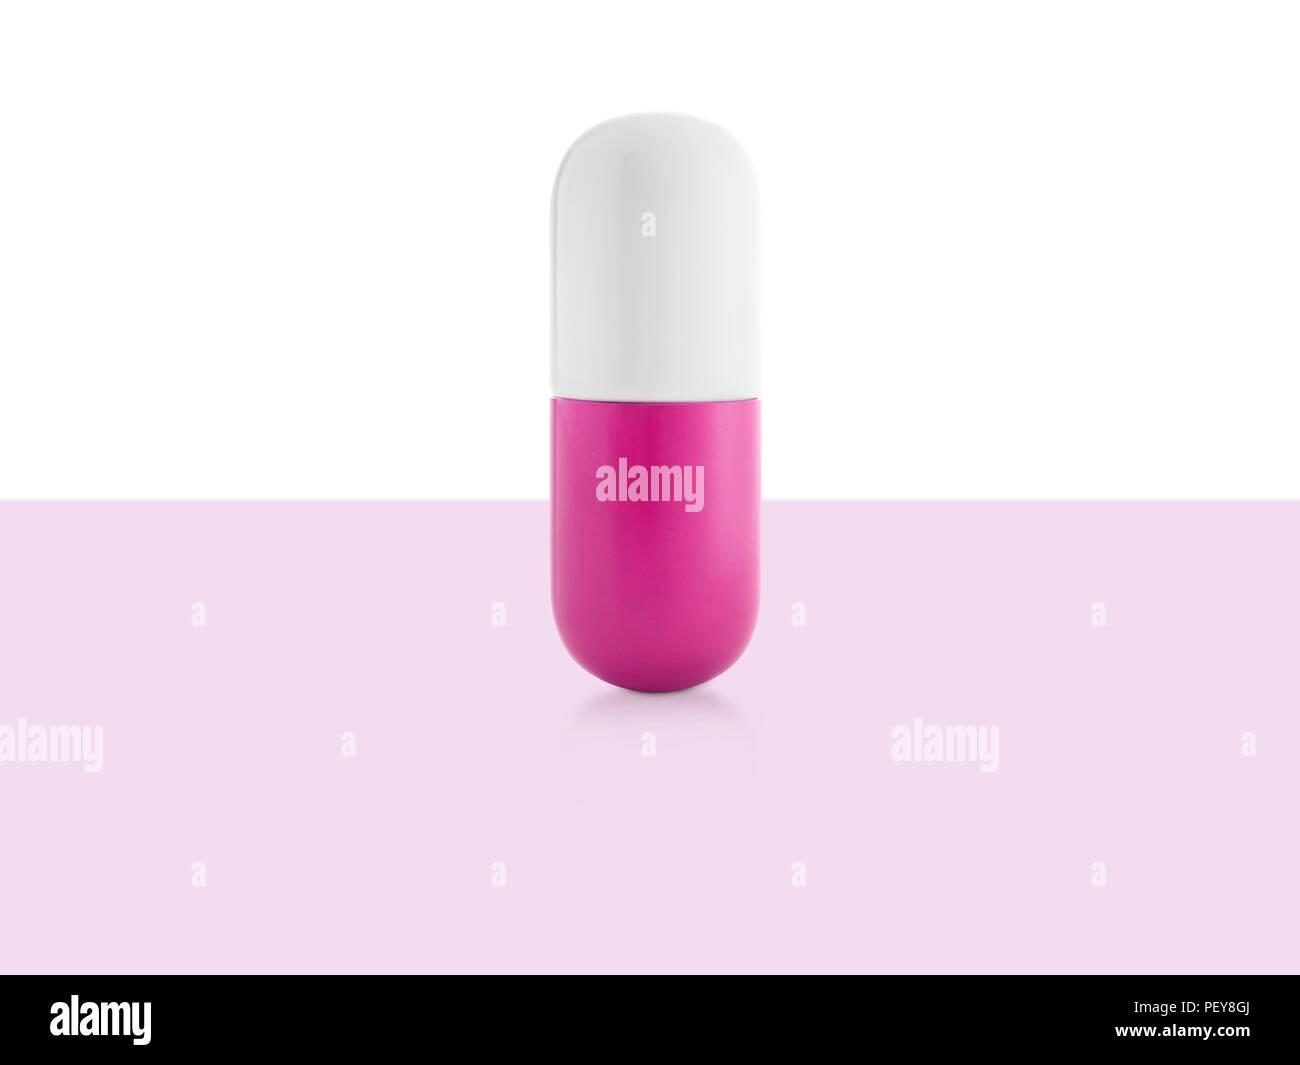 Pink and white capsule, studio shot. - Stock Image